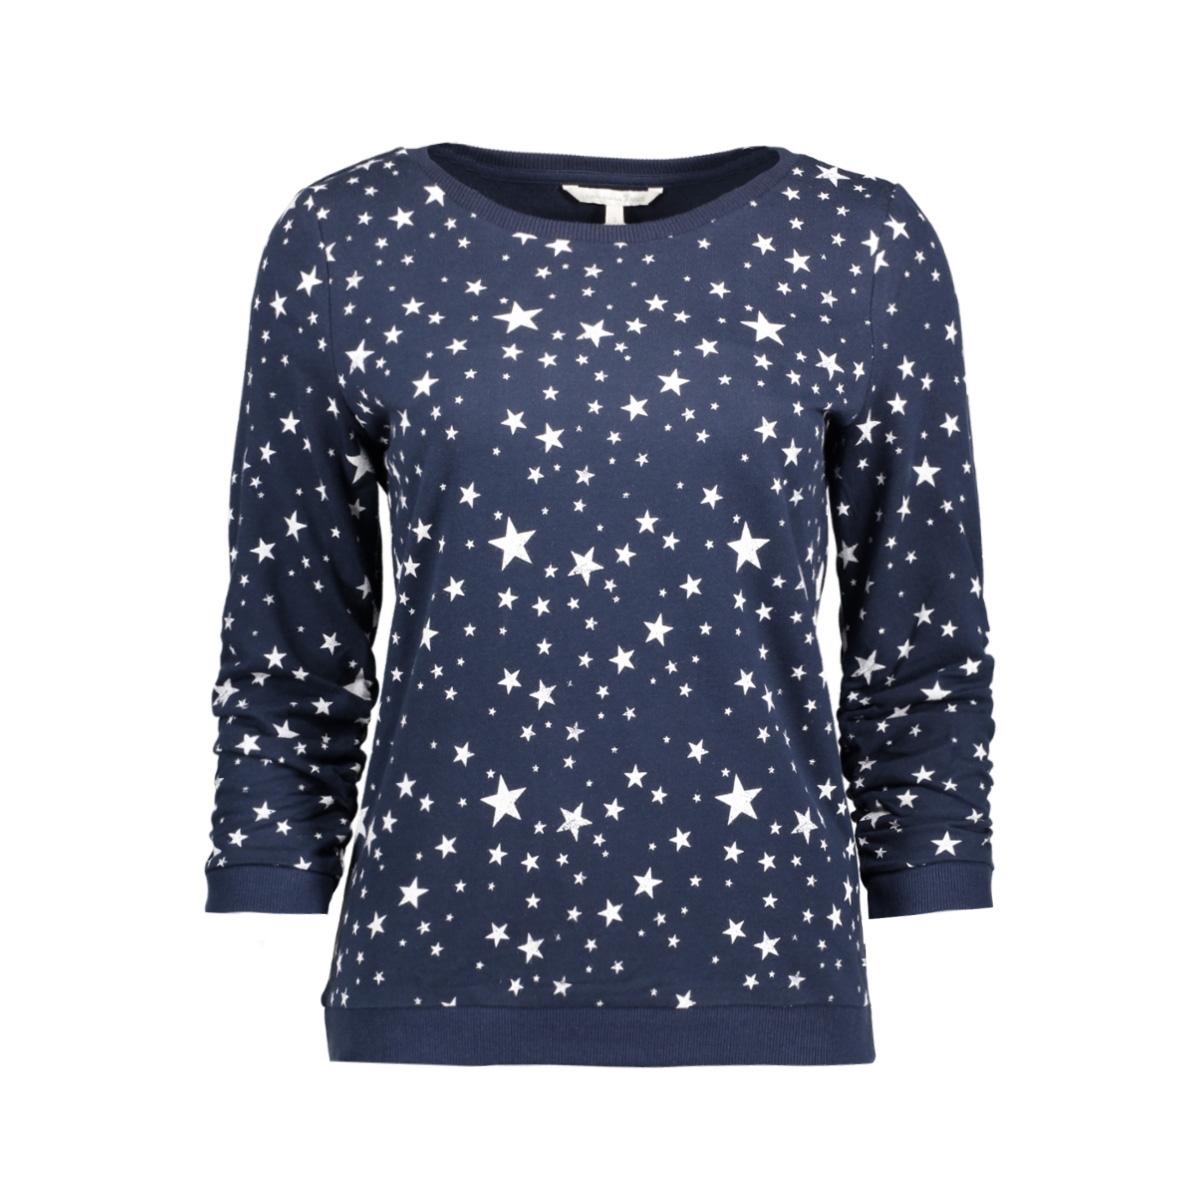 2531326.09.71 tom tailor sweater 6593